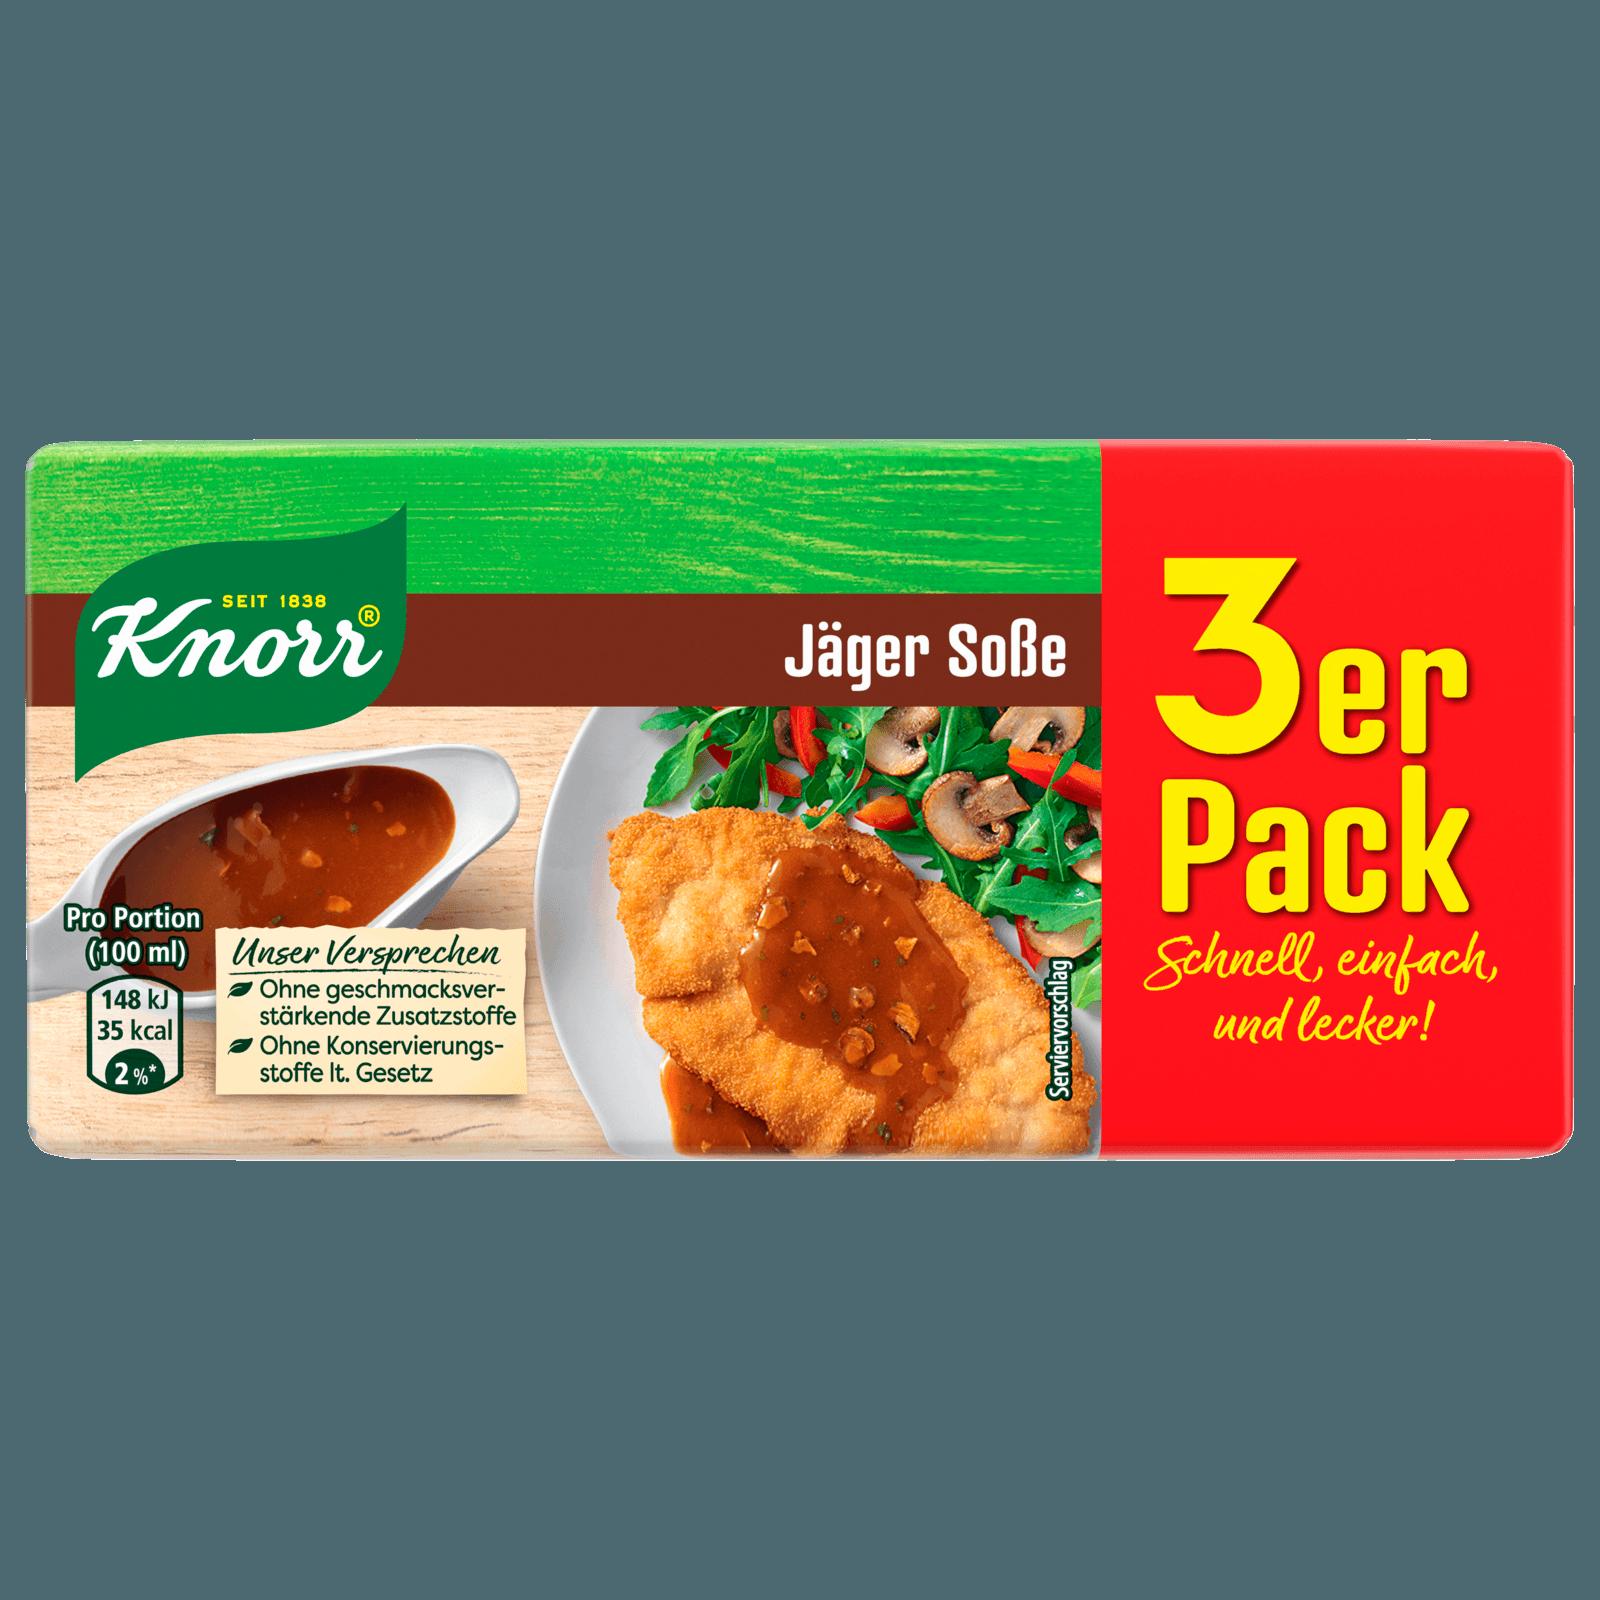 Knorr Jäger Soße 3 x 250 ml